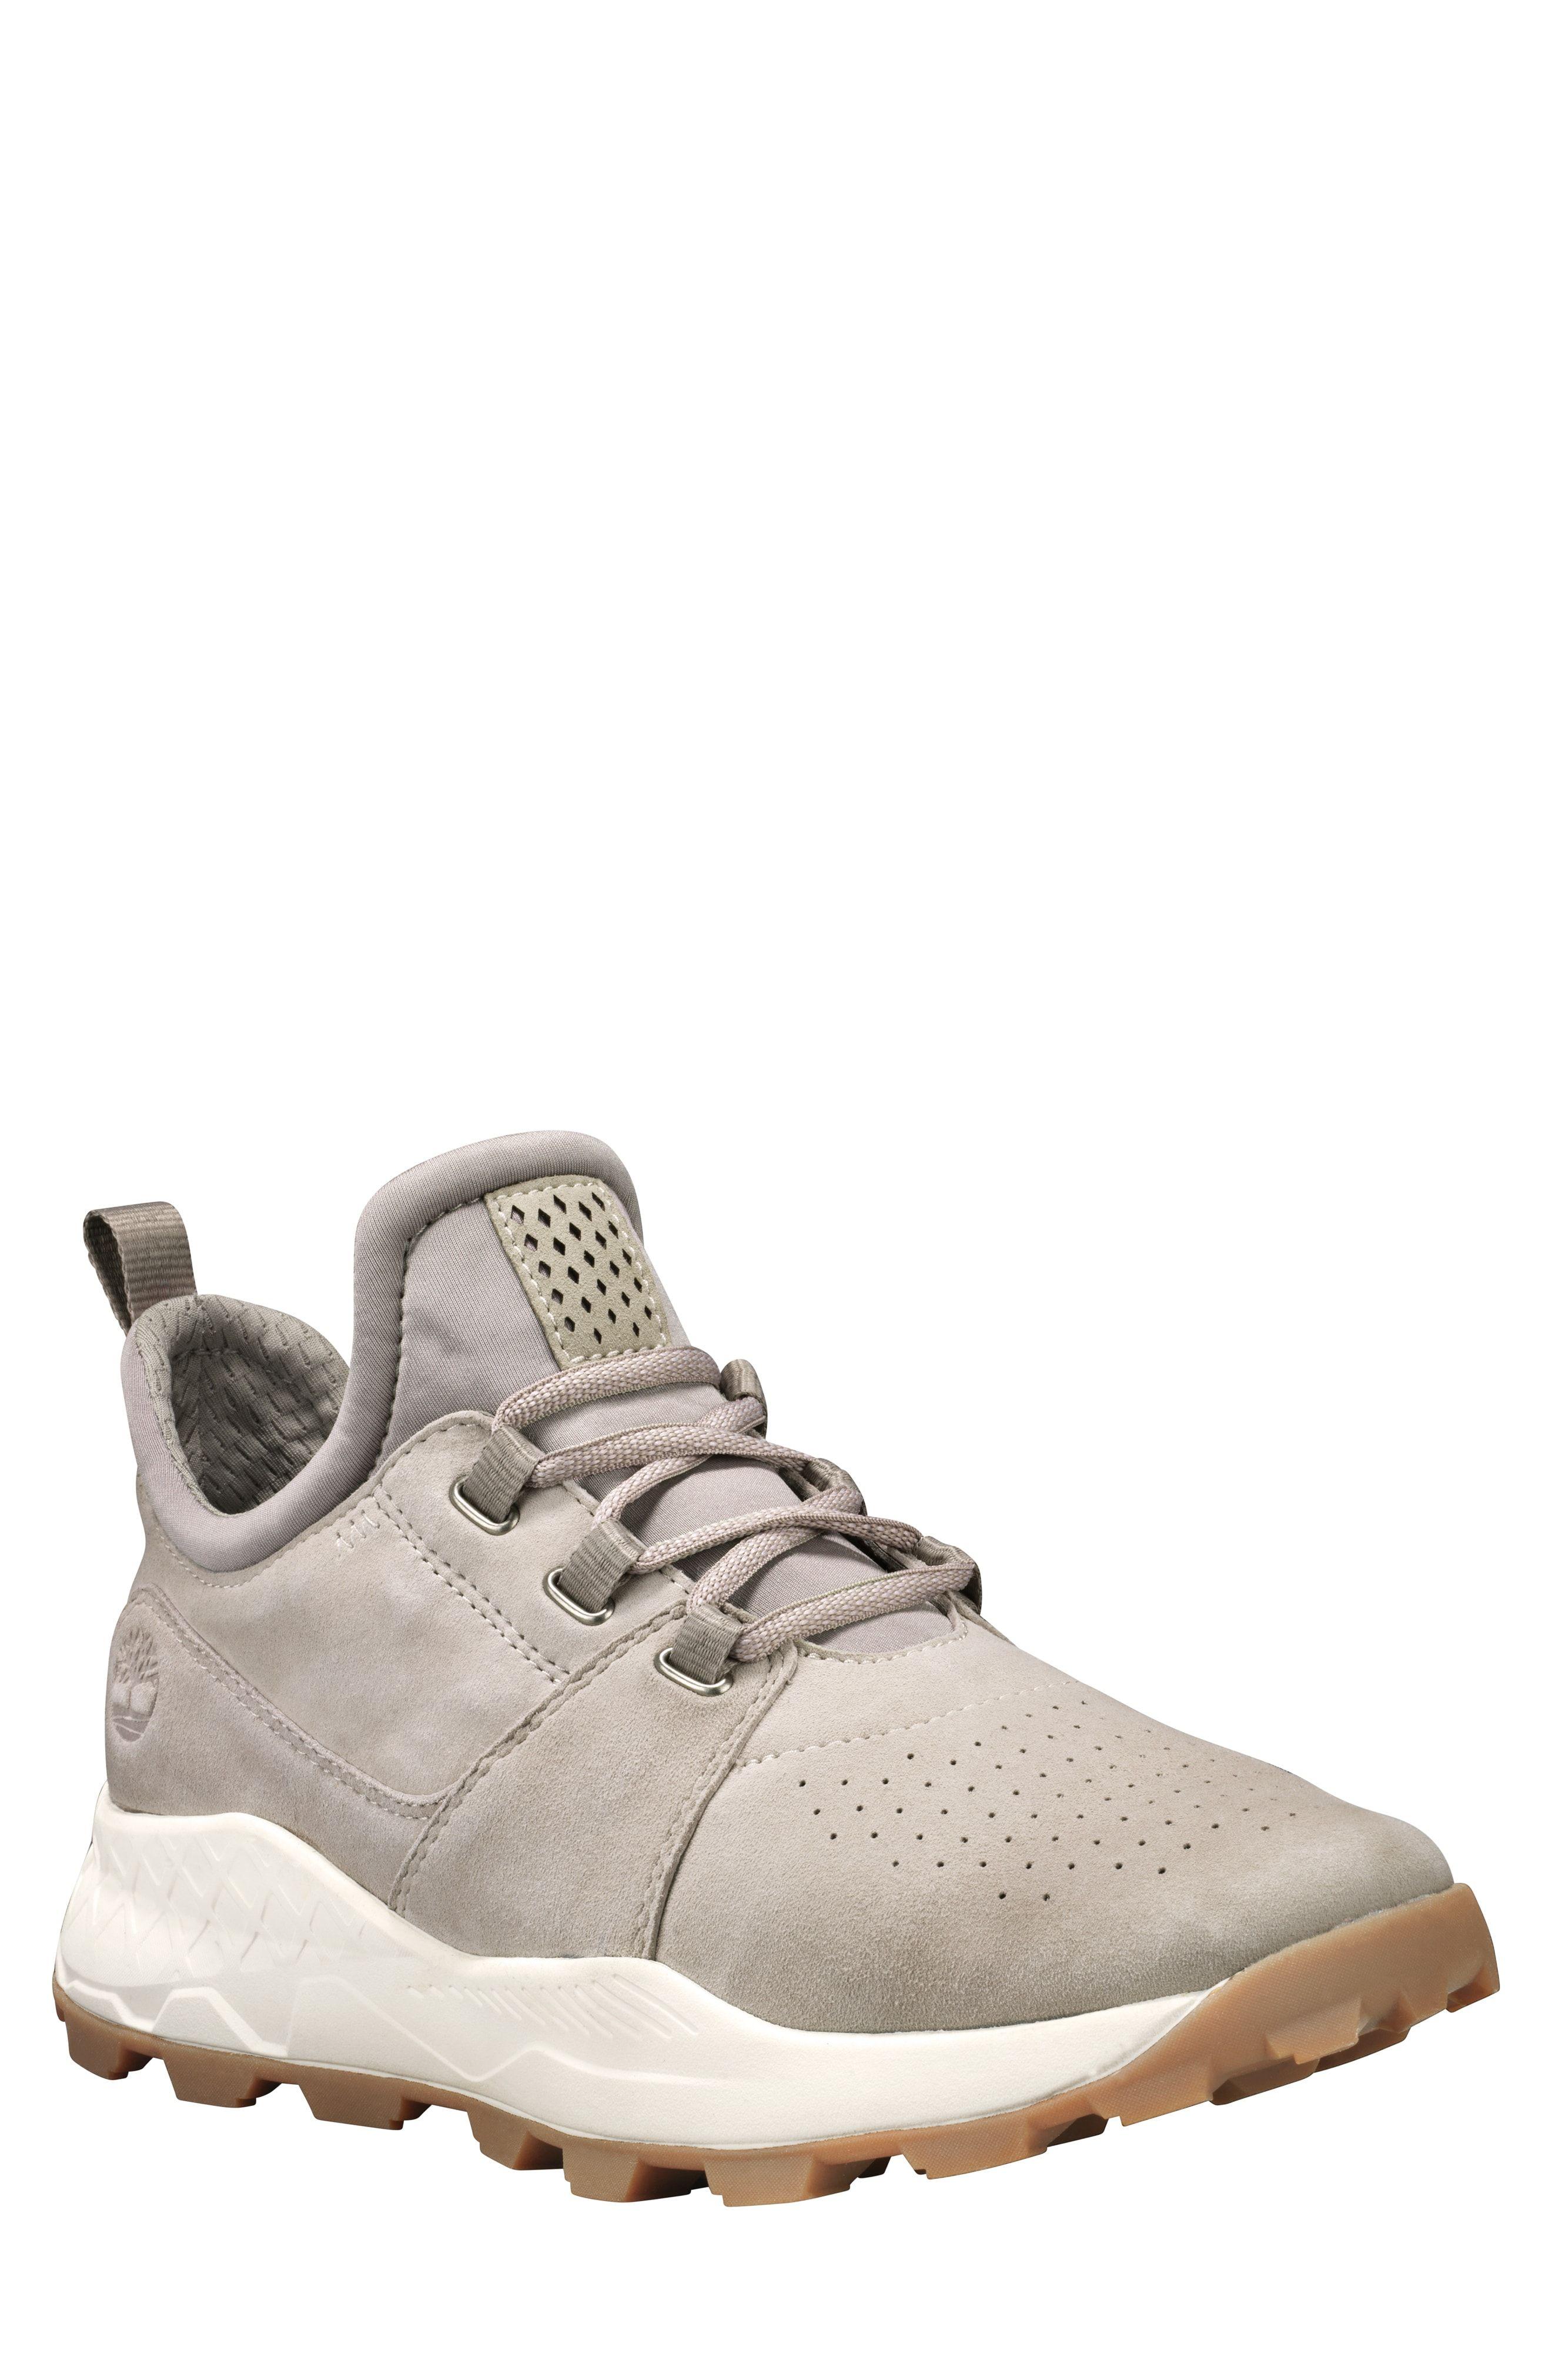 Brooklyn Waterproof Brooklyn Timberland Sneakertimberlandshoes Timberland Sneakertimberlandshoes Waterproof v8nNw0mO